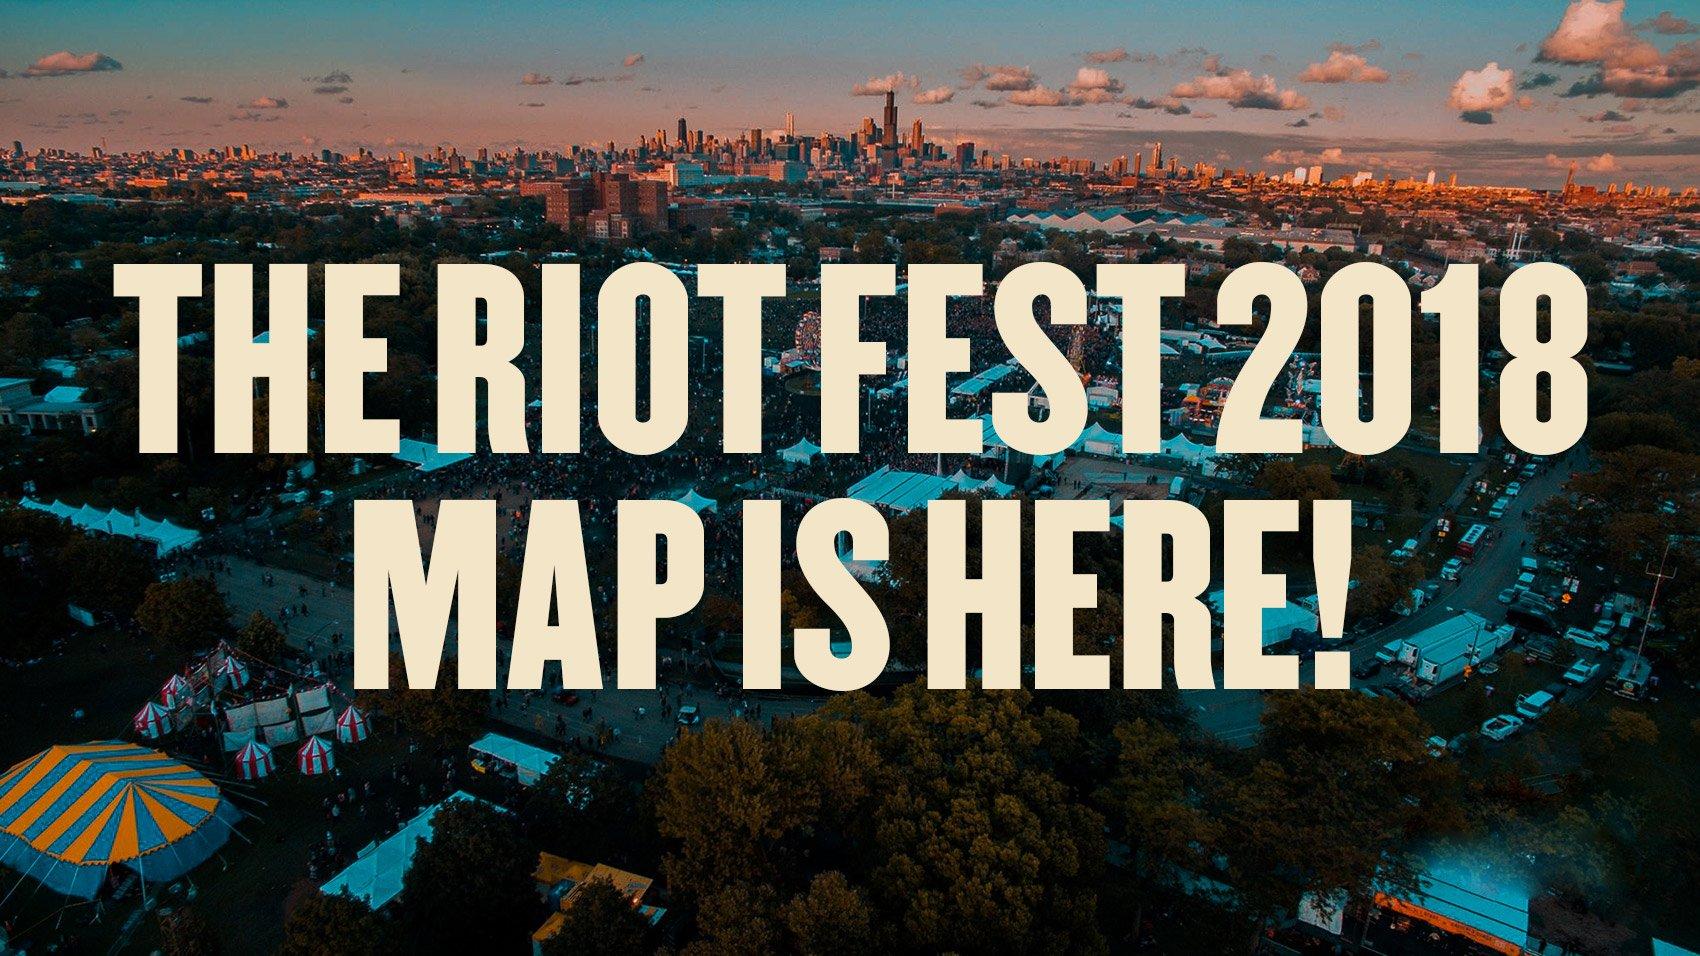 The Riot Fest map is here. https://t.co/IVJ5Z6pR1d https://t.co/8cw1Ku5x3q